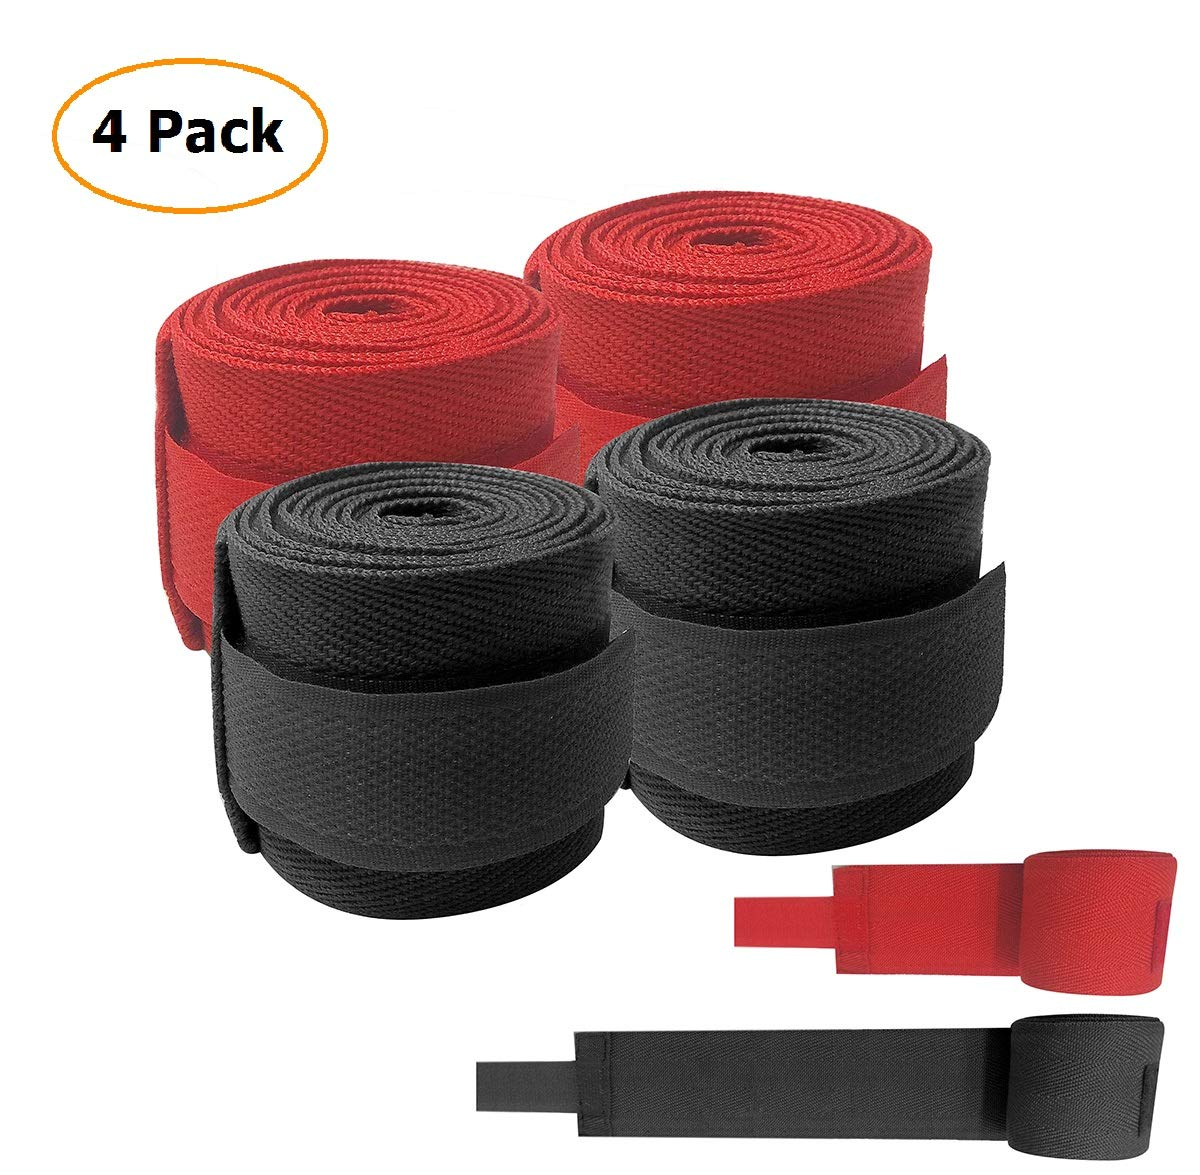 ZOSEN Vendaje de boxeo, muñequeras de algodón para boxeo, Muay Thai Taekwondo Sanda lucha 2,5 metros, 2 pares (negro y rojo)